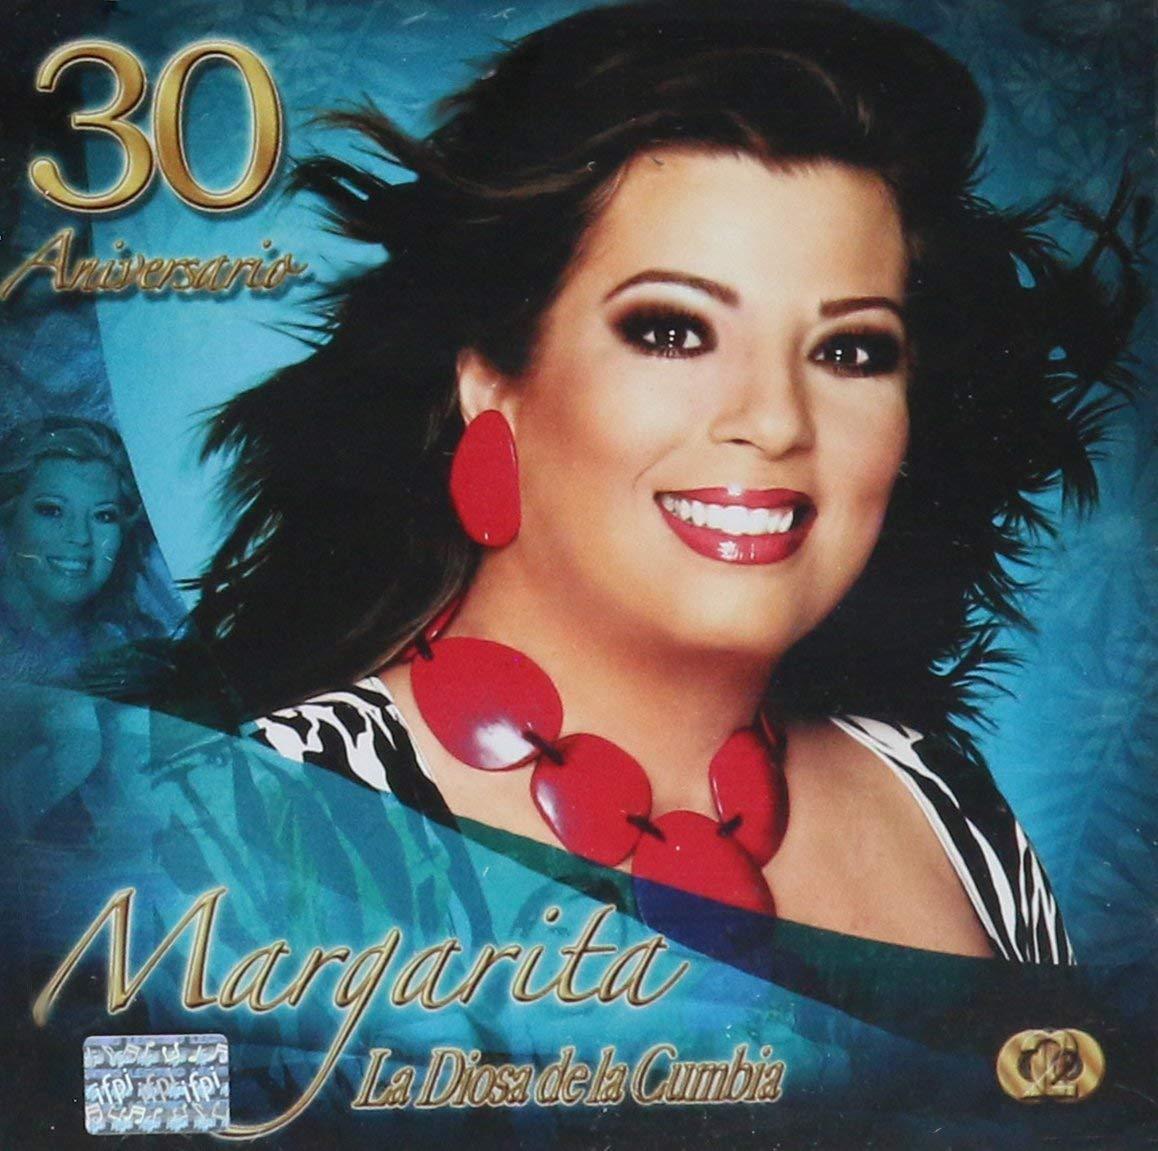 mart Margarita 2CDs Arlington Mall La Diosa De Peerless-Wa Cumbia Aniversario 30